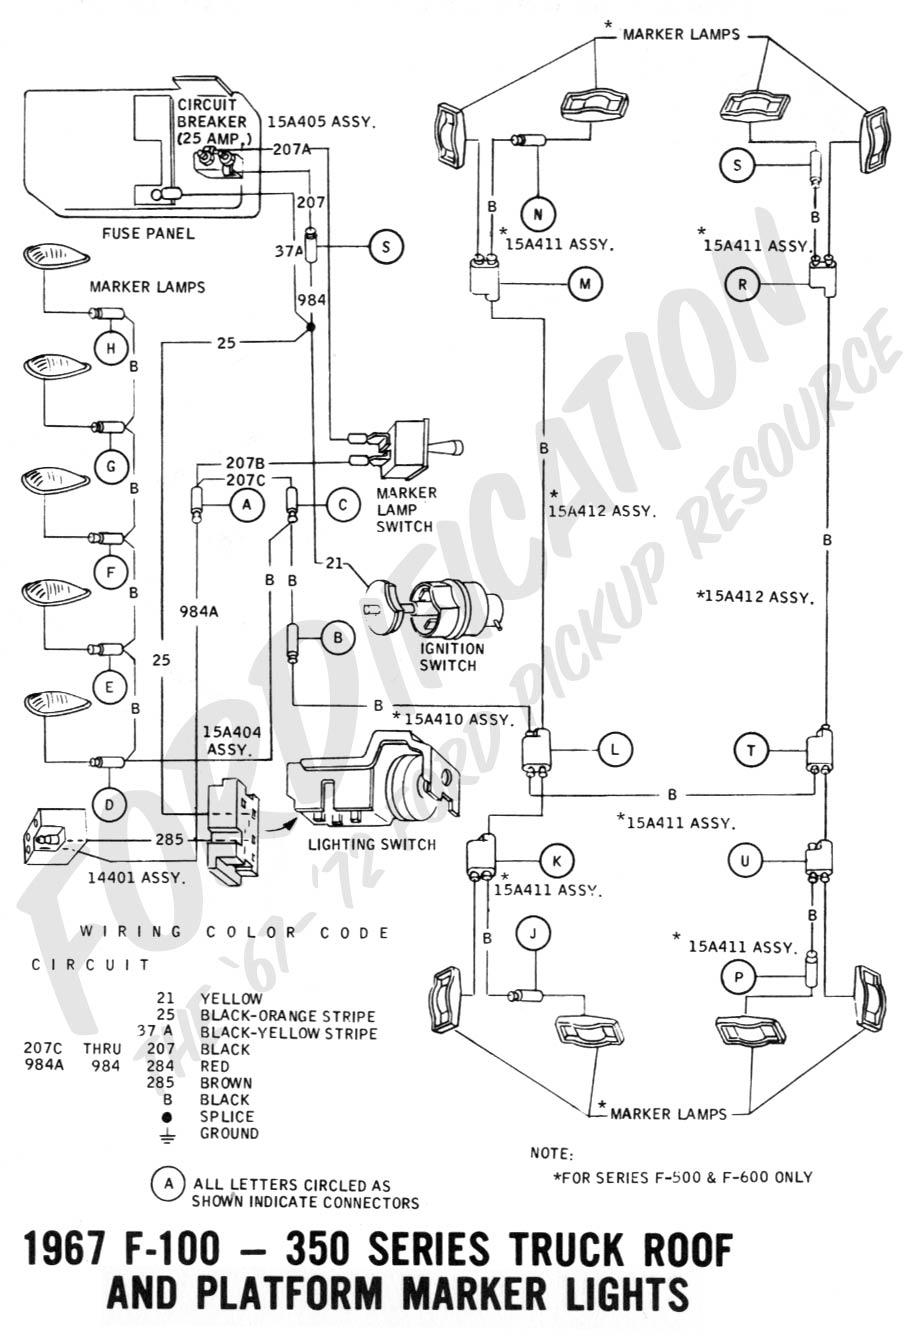 Awe Inspiring Ford Truck Technical Drawings And Schematics Section H Wiring Wiring Cloud Ittabpendurdonanfuldomelitekicepsianuembamohammedshrineorg